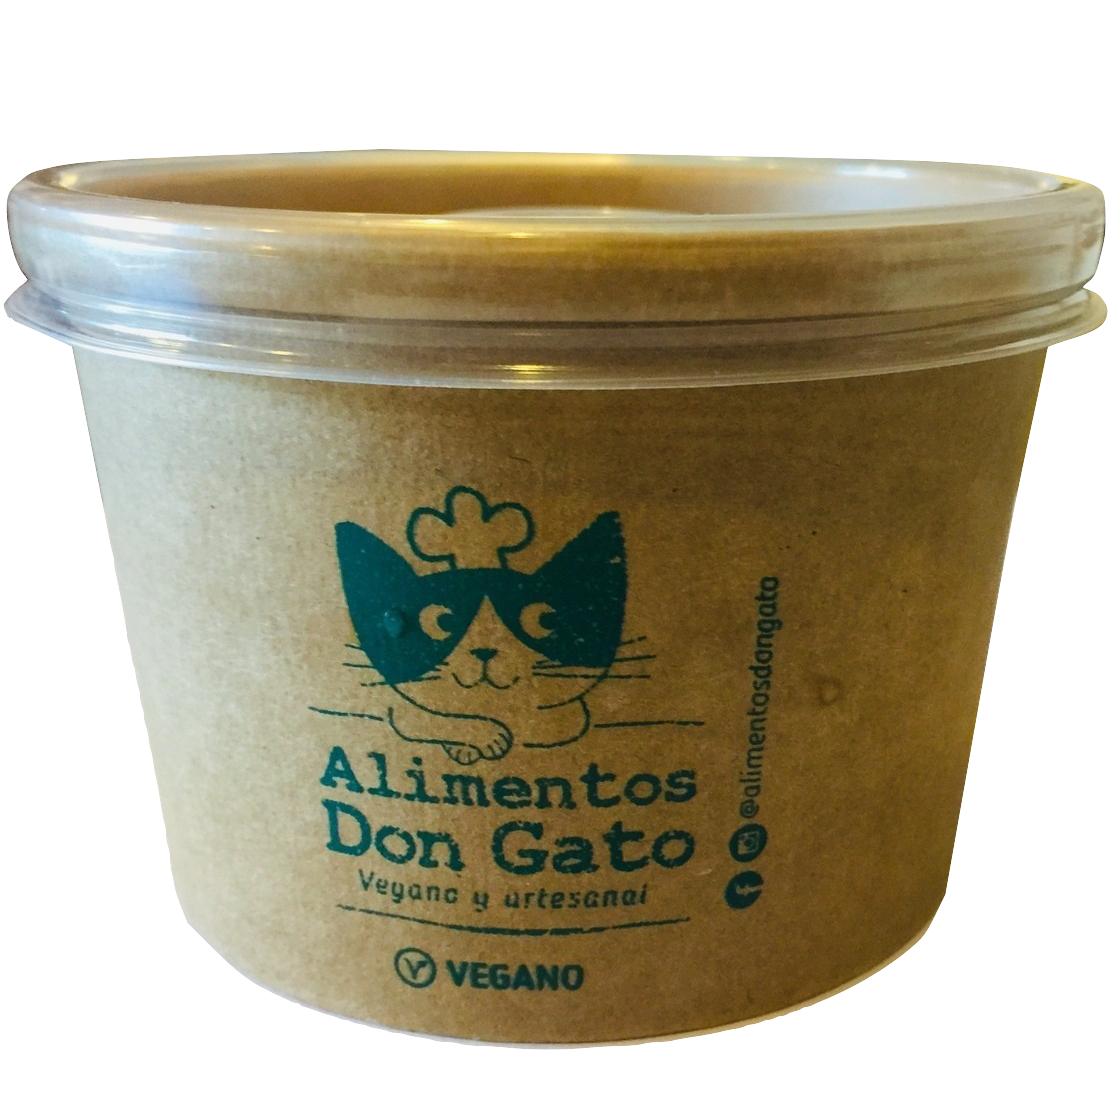 Helado Vegano Chocolates con Almendras, Alimentos Don Gato